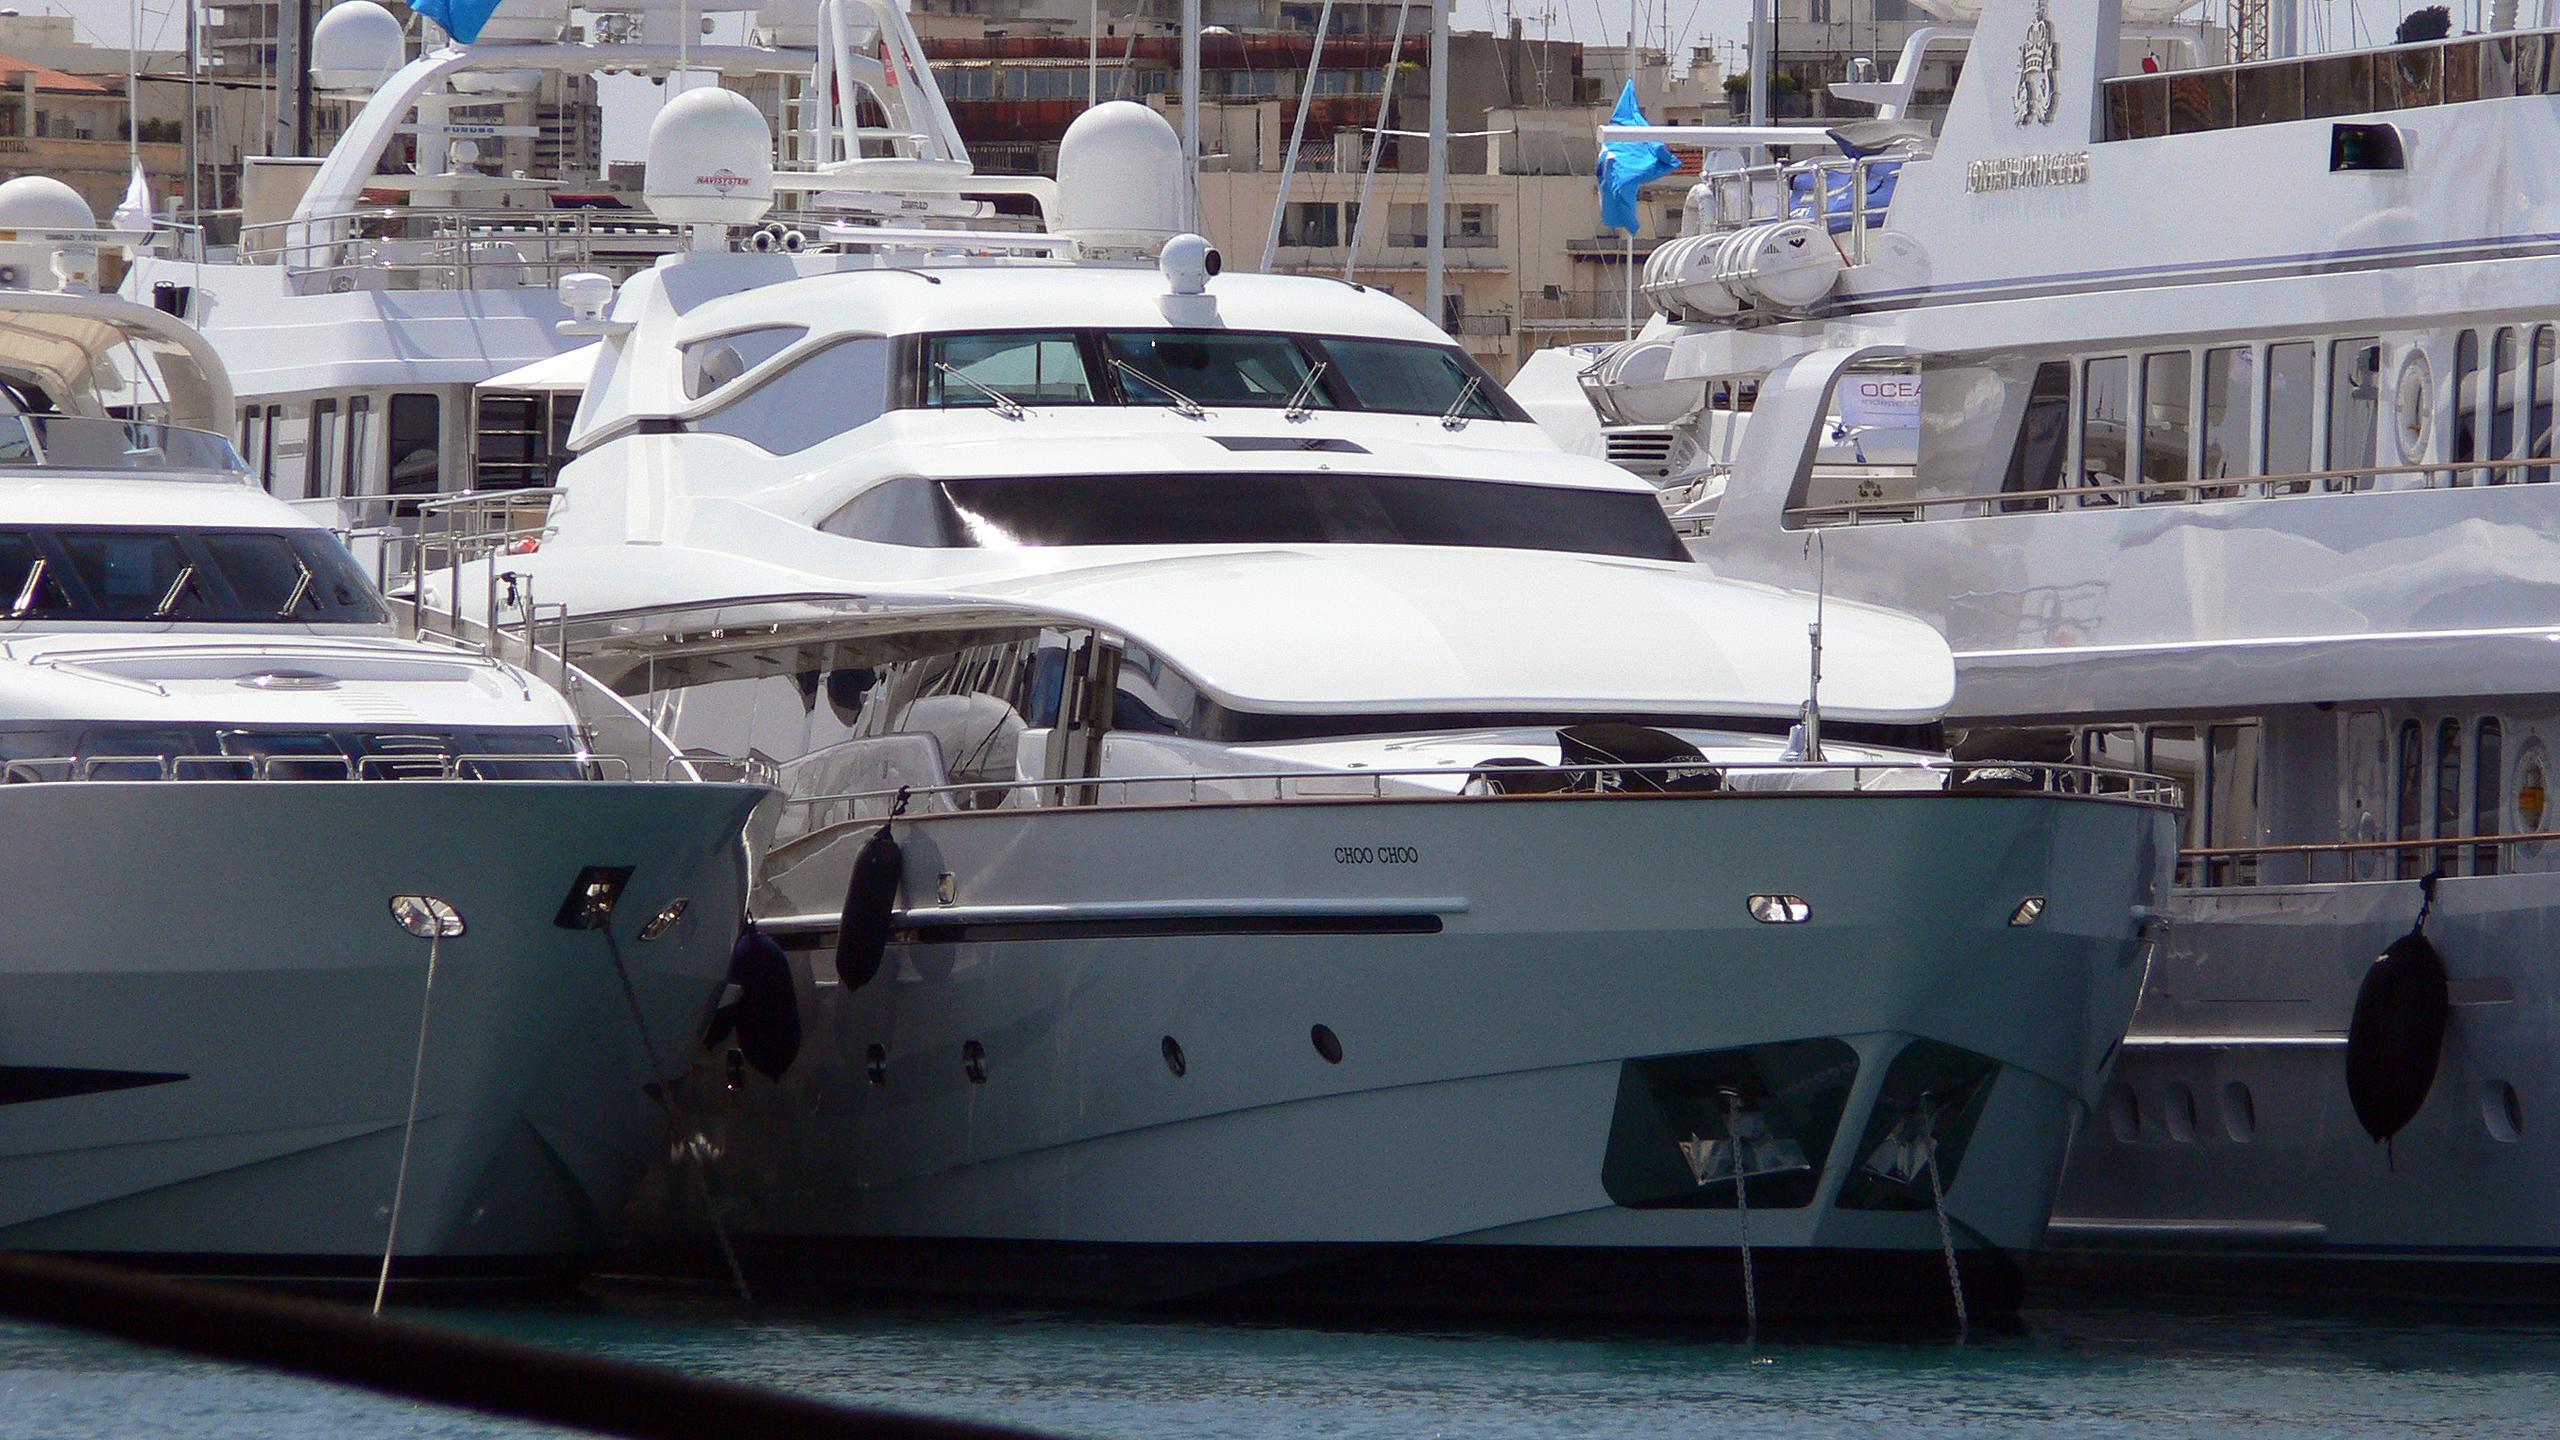 choo-choo-motor-yacht-new-versilcraft-2006-36m-bow